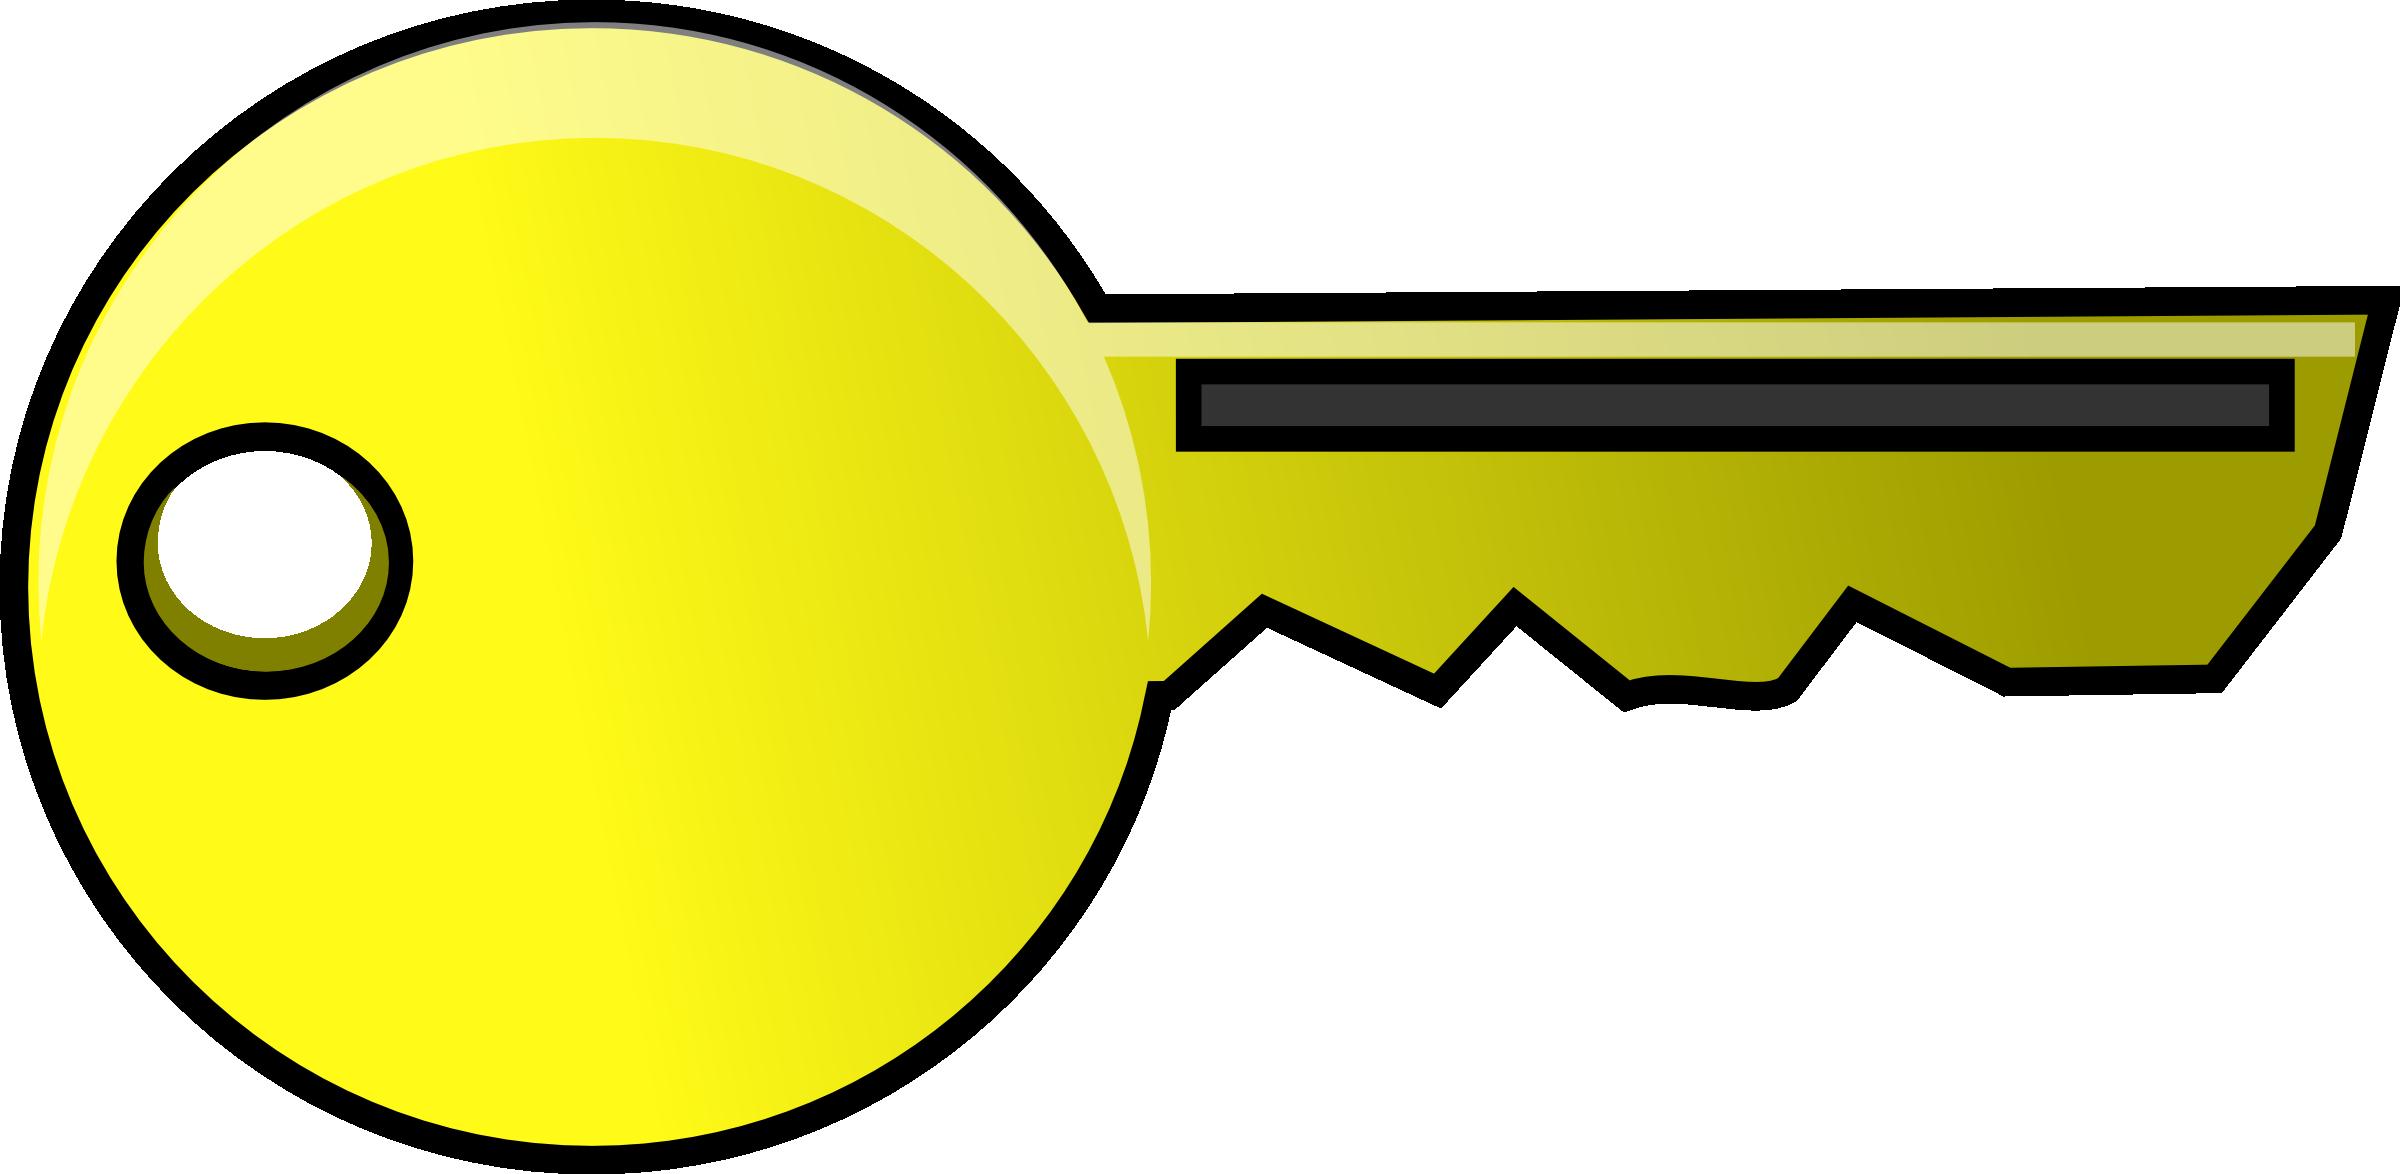 Gold key clipart 2